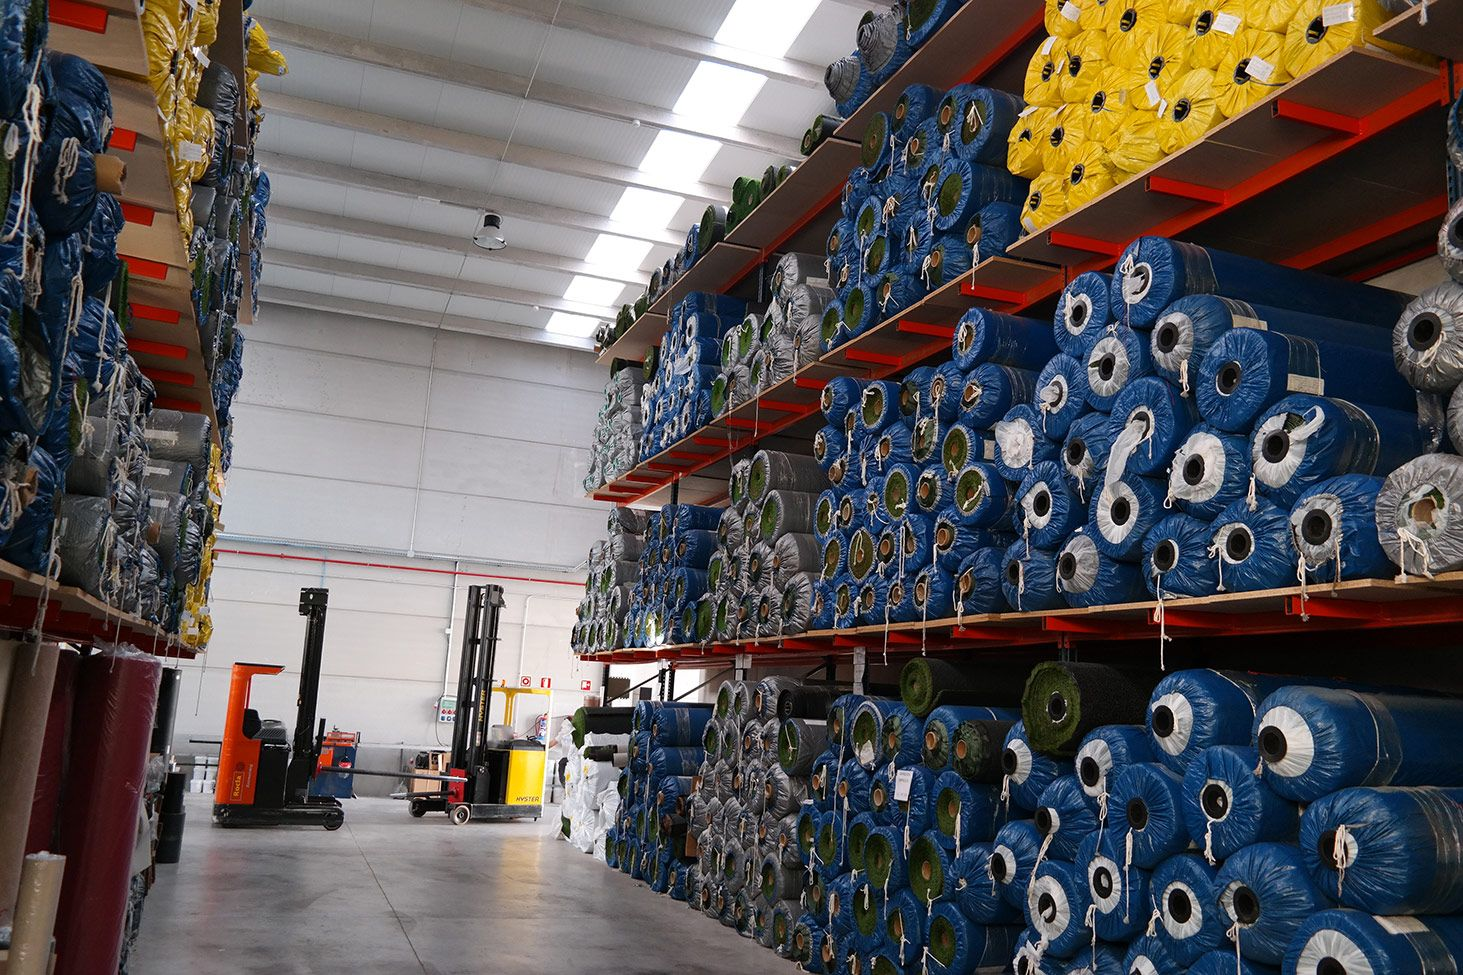 aisle between racks for 2 meter wide rolls